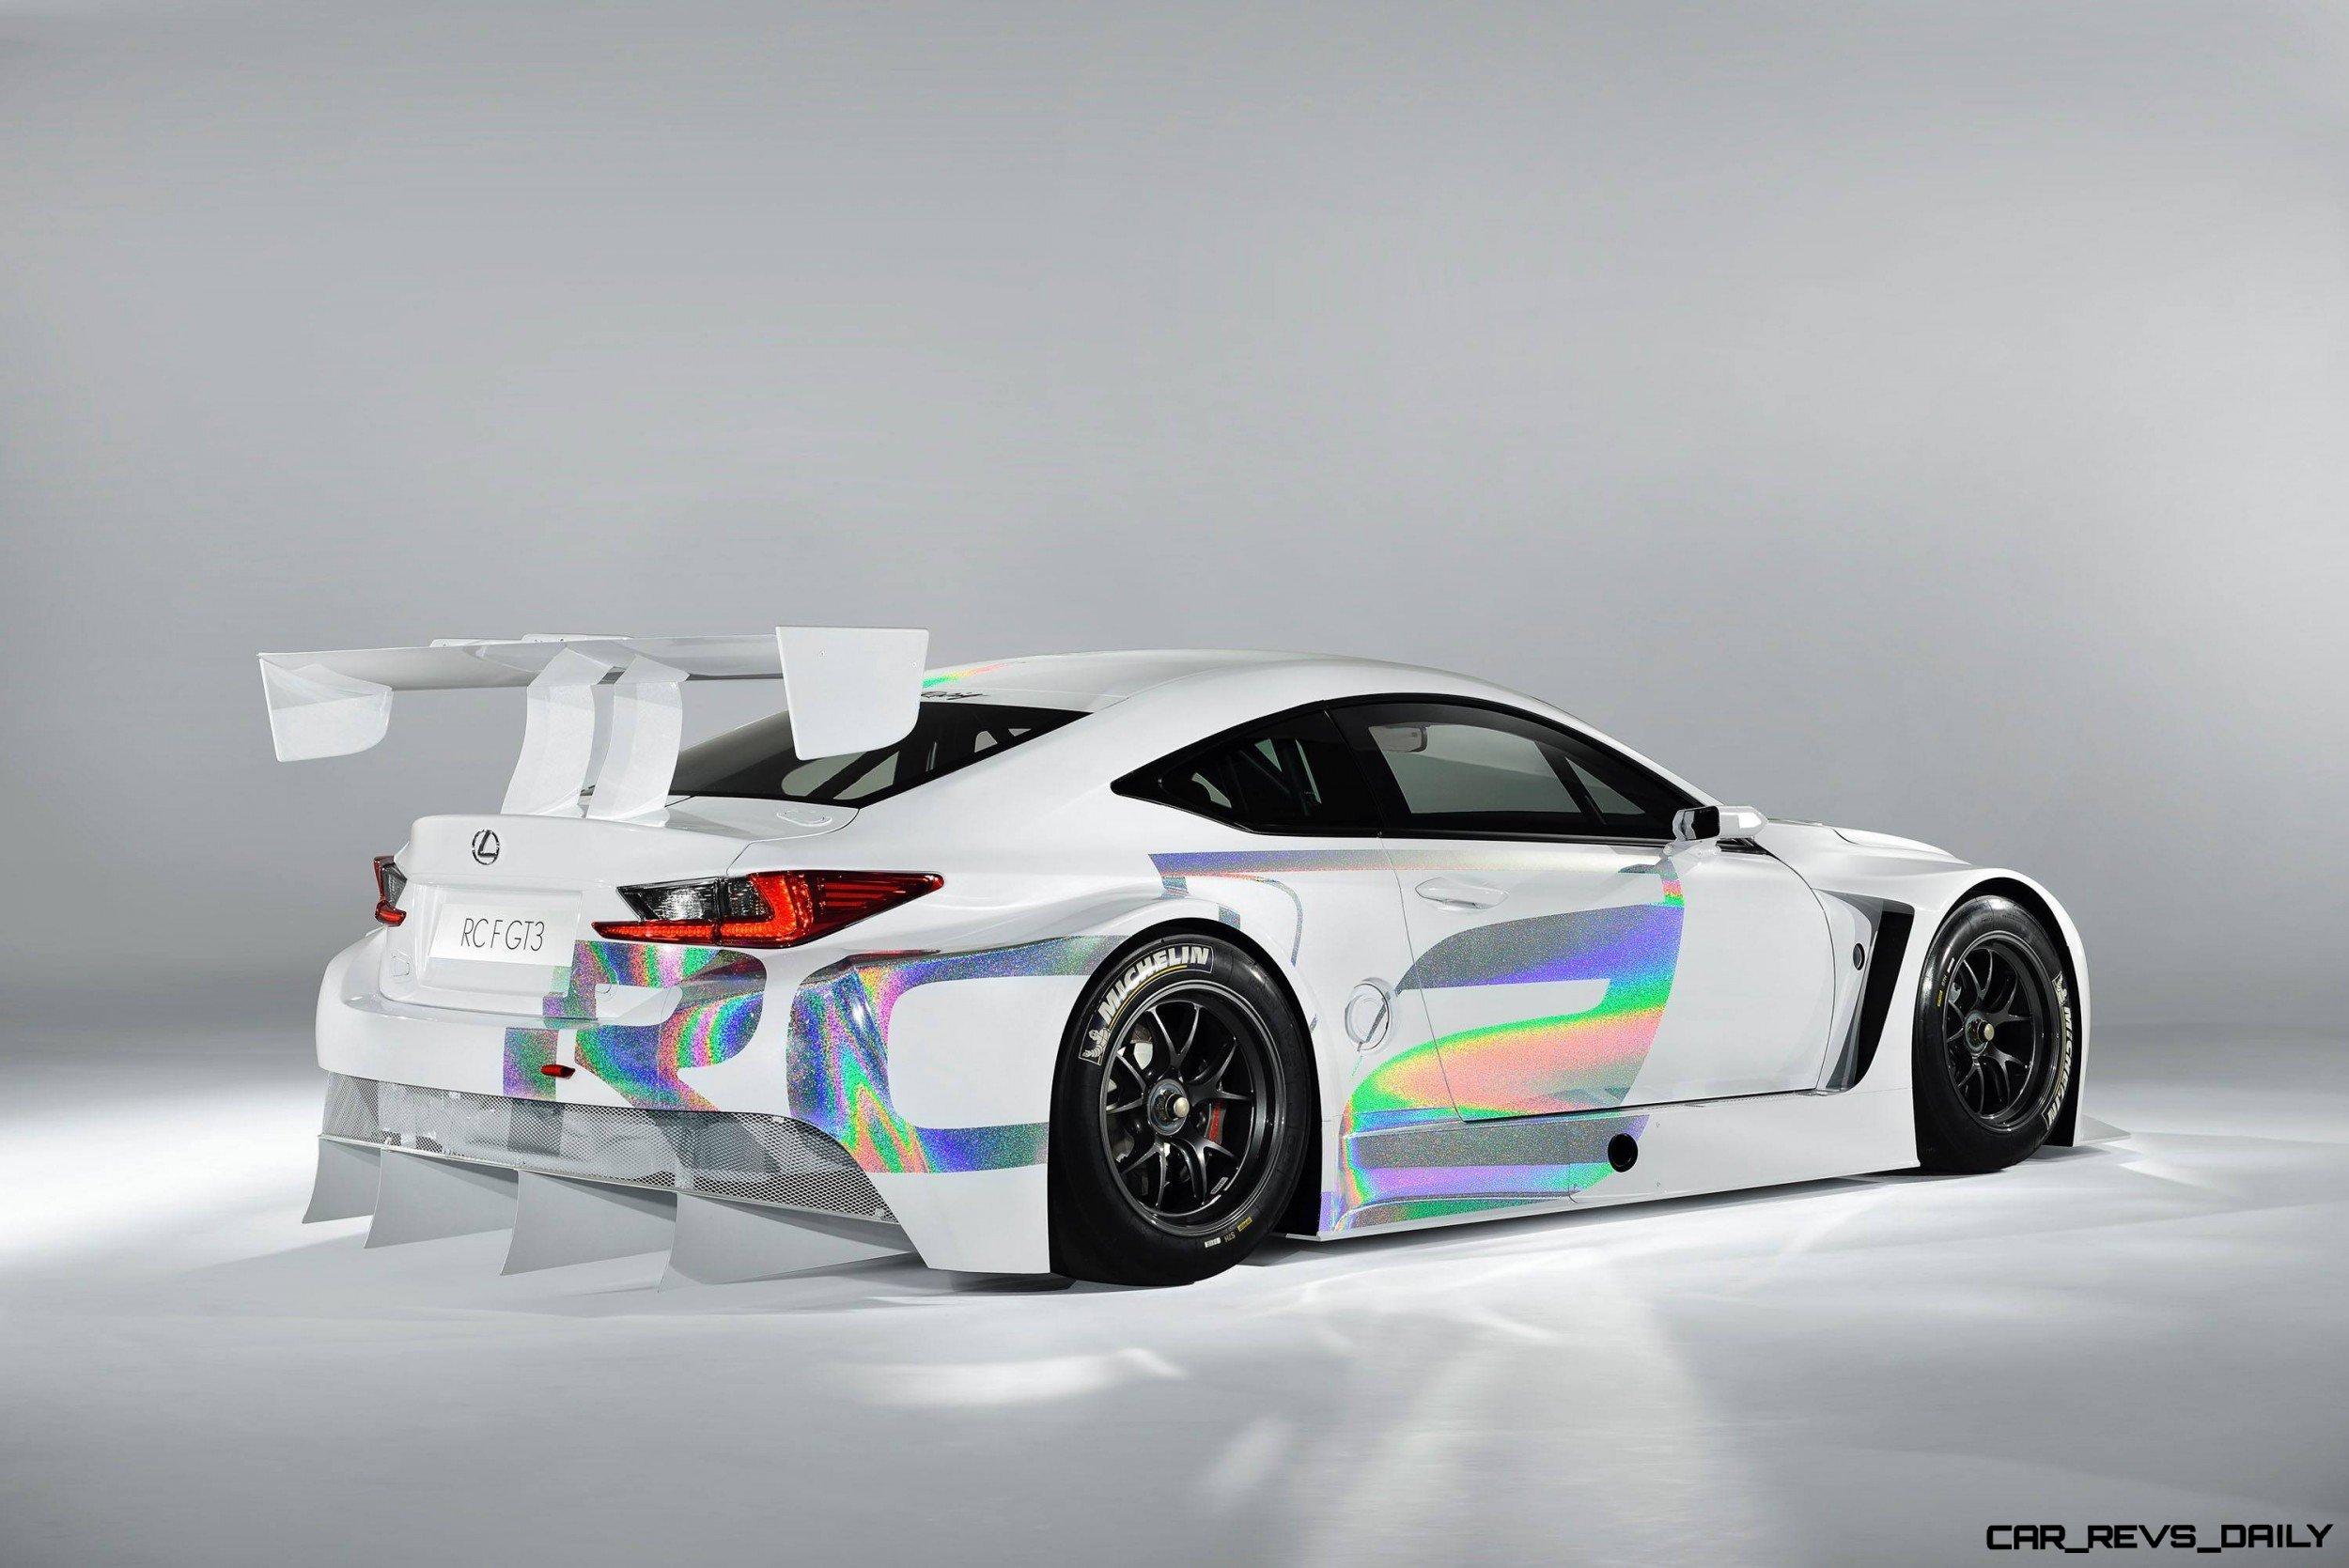 Lexus_RC_F_GT3_Concept_009